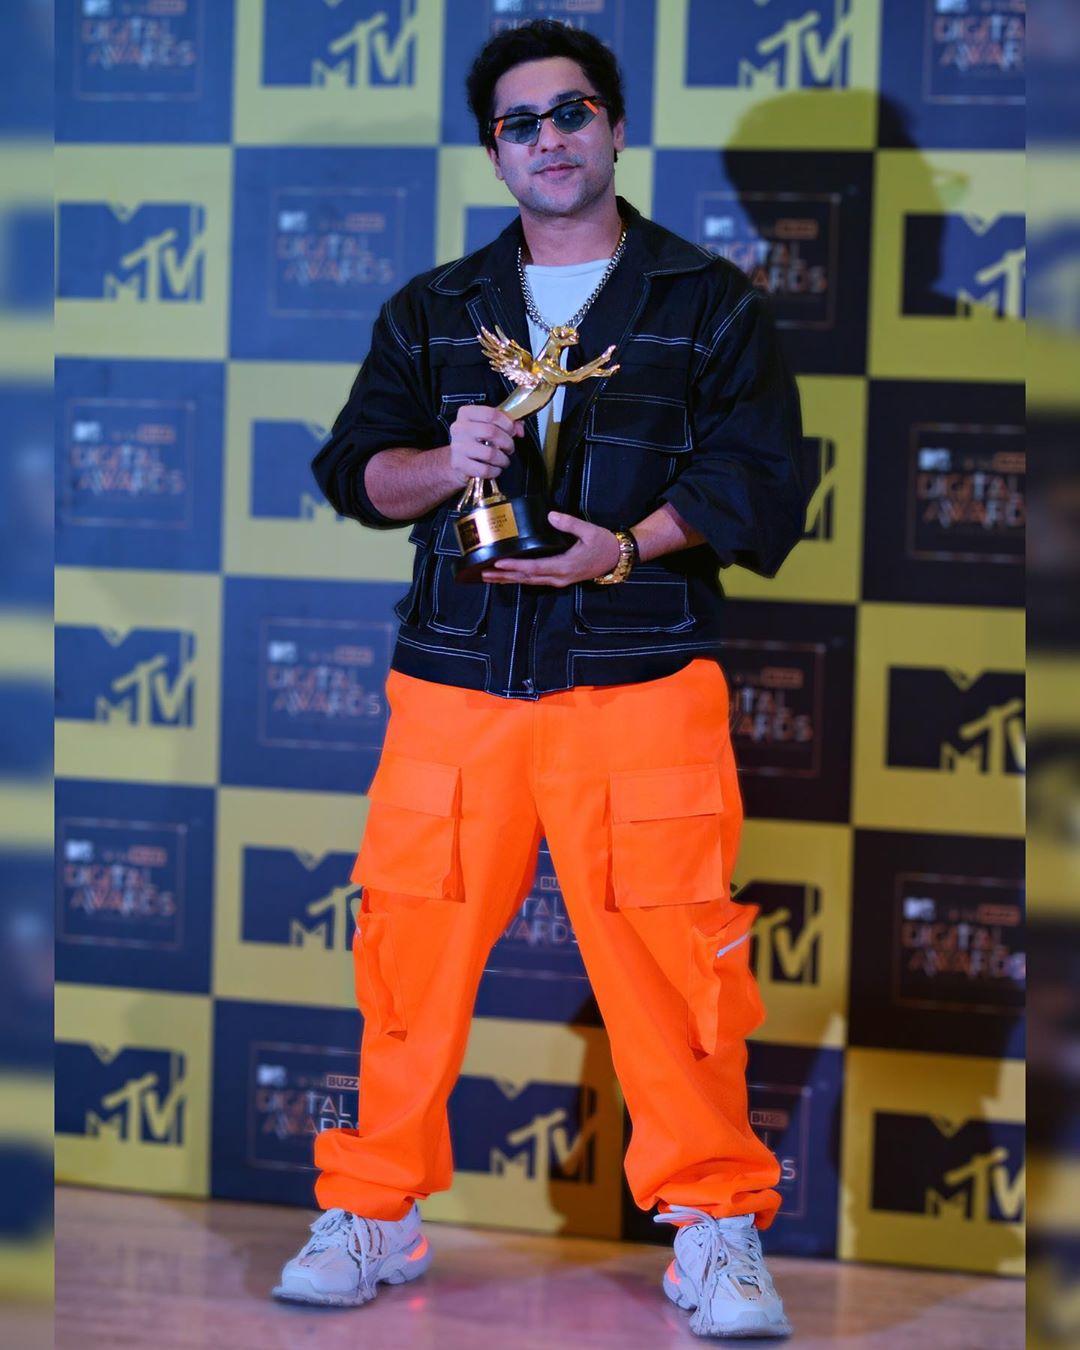 Harsh Beniwal in Rising star award